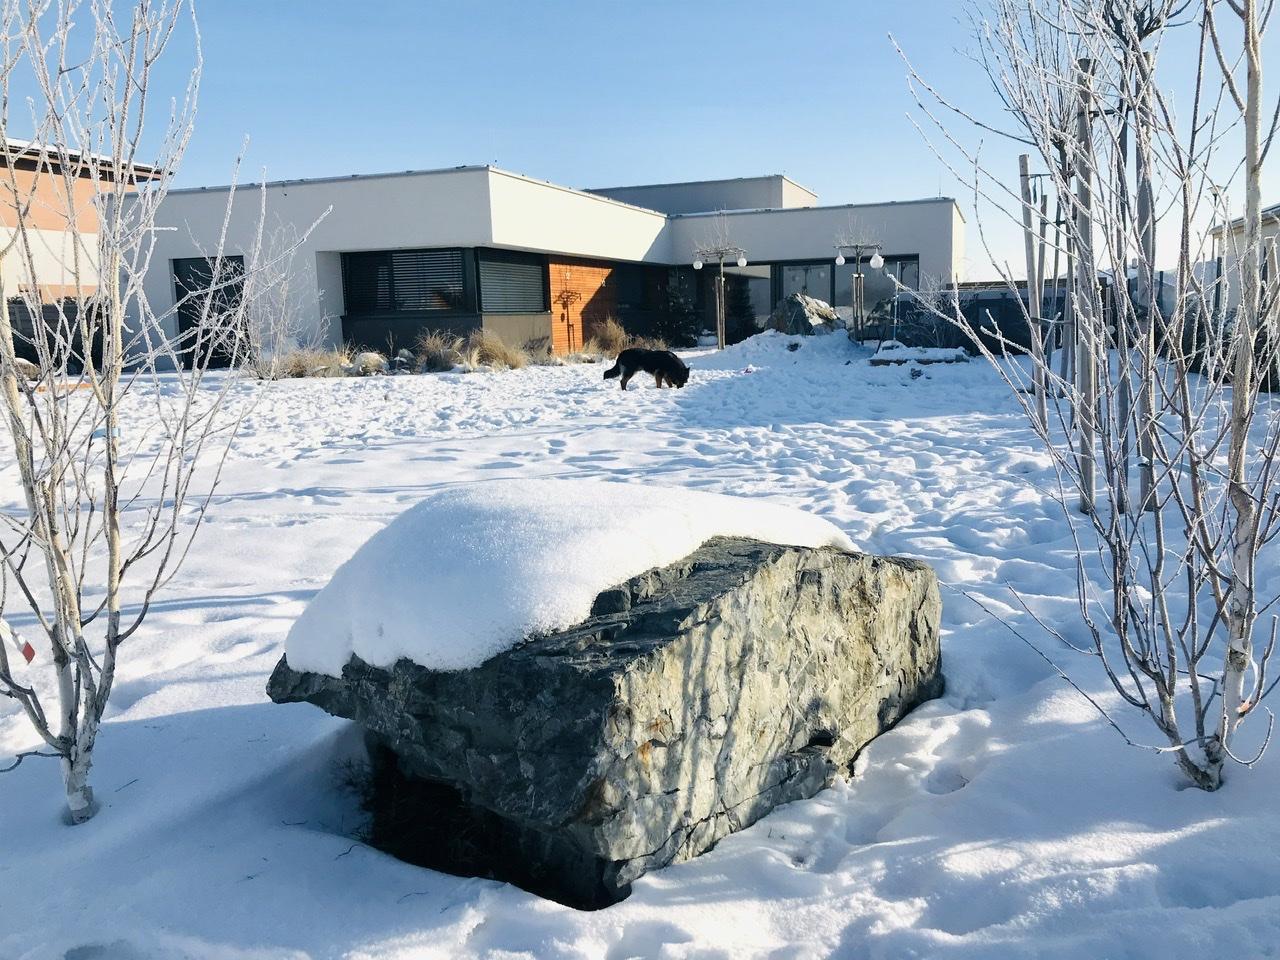 Naše L-ko - 2021 - stále dokončujeme - Domček z dialky - posledné zasnežené fotky  - u kameňa mladé briezky